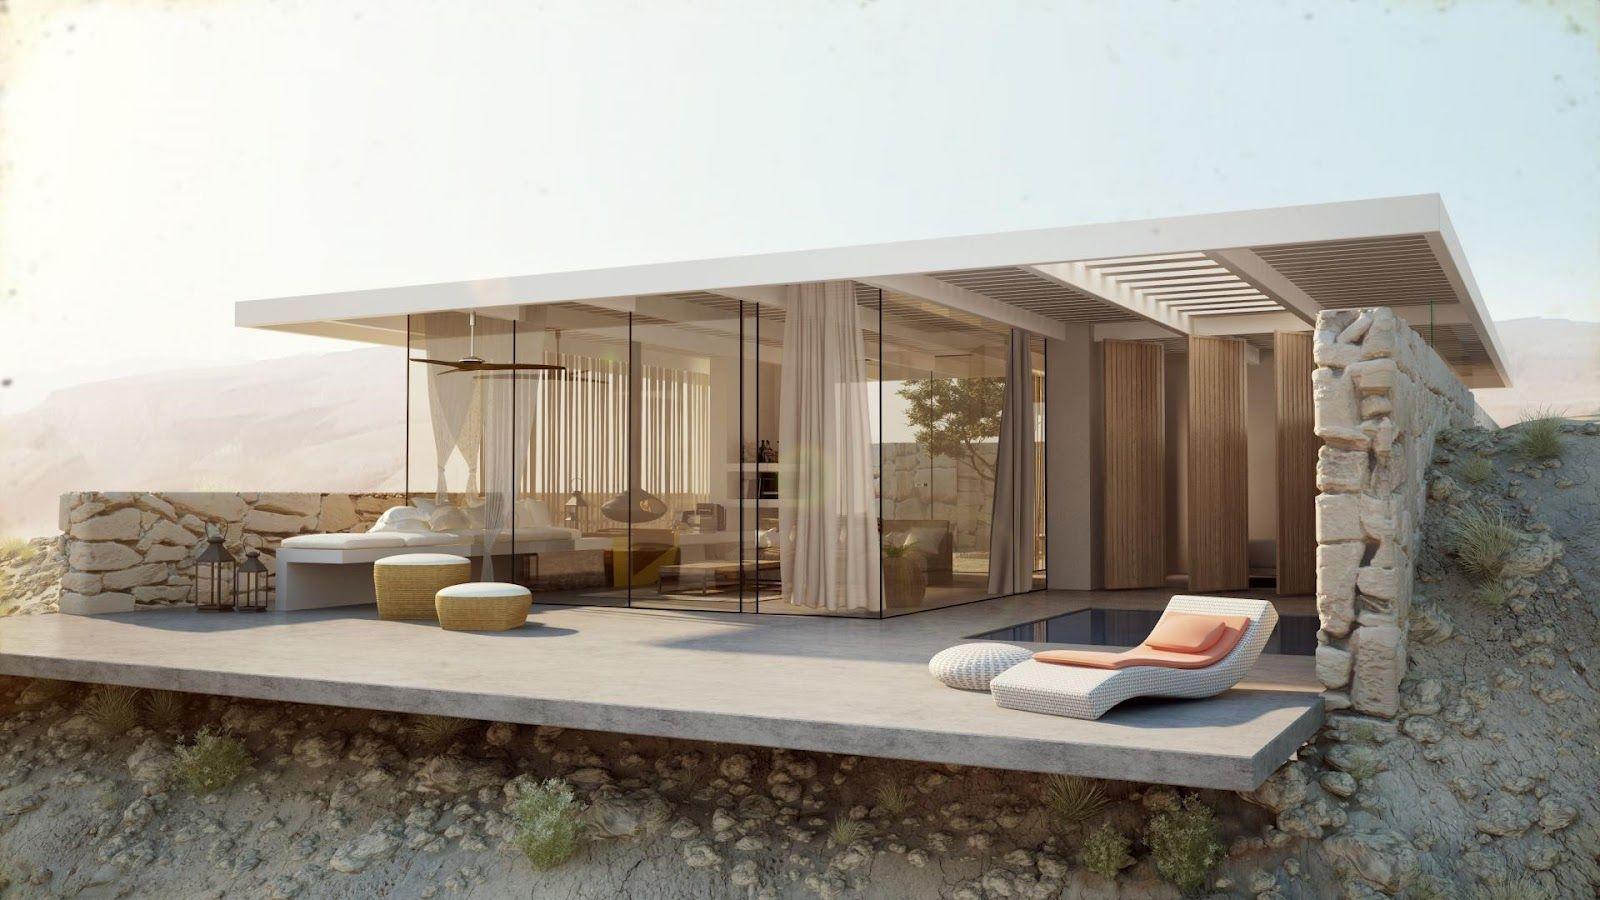 Architecture Organic Architecture Desert Pavilion Architectural